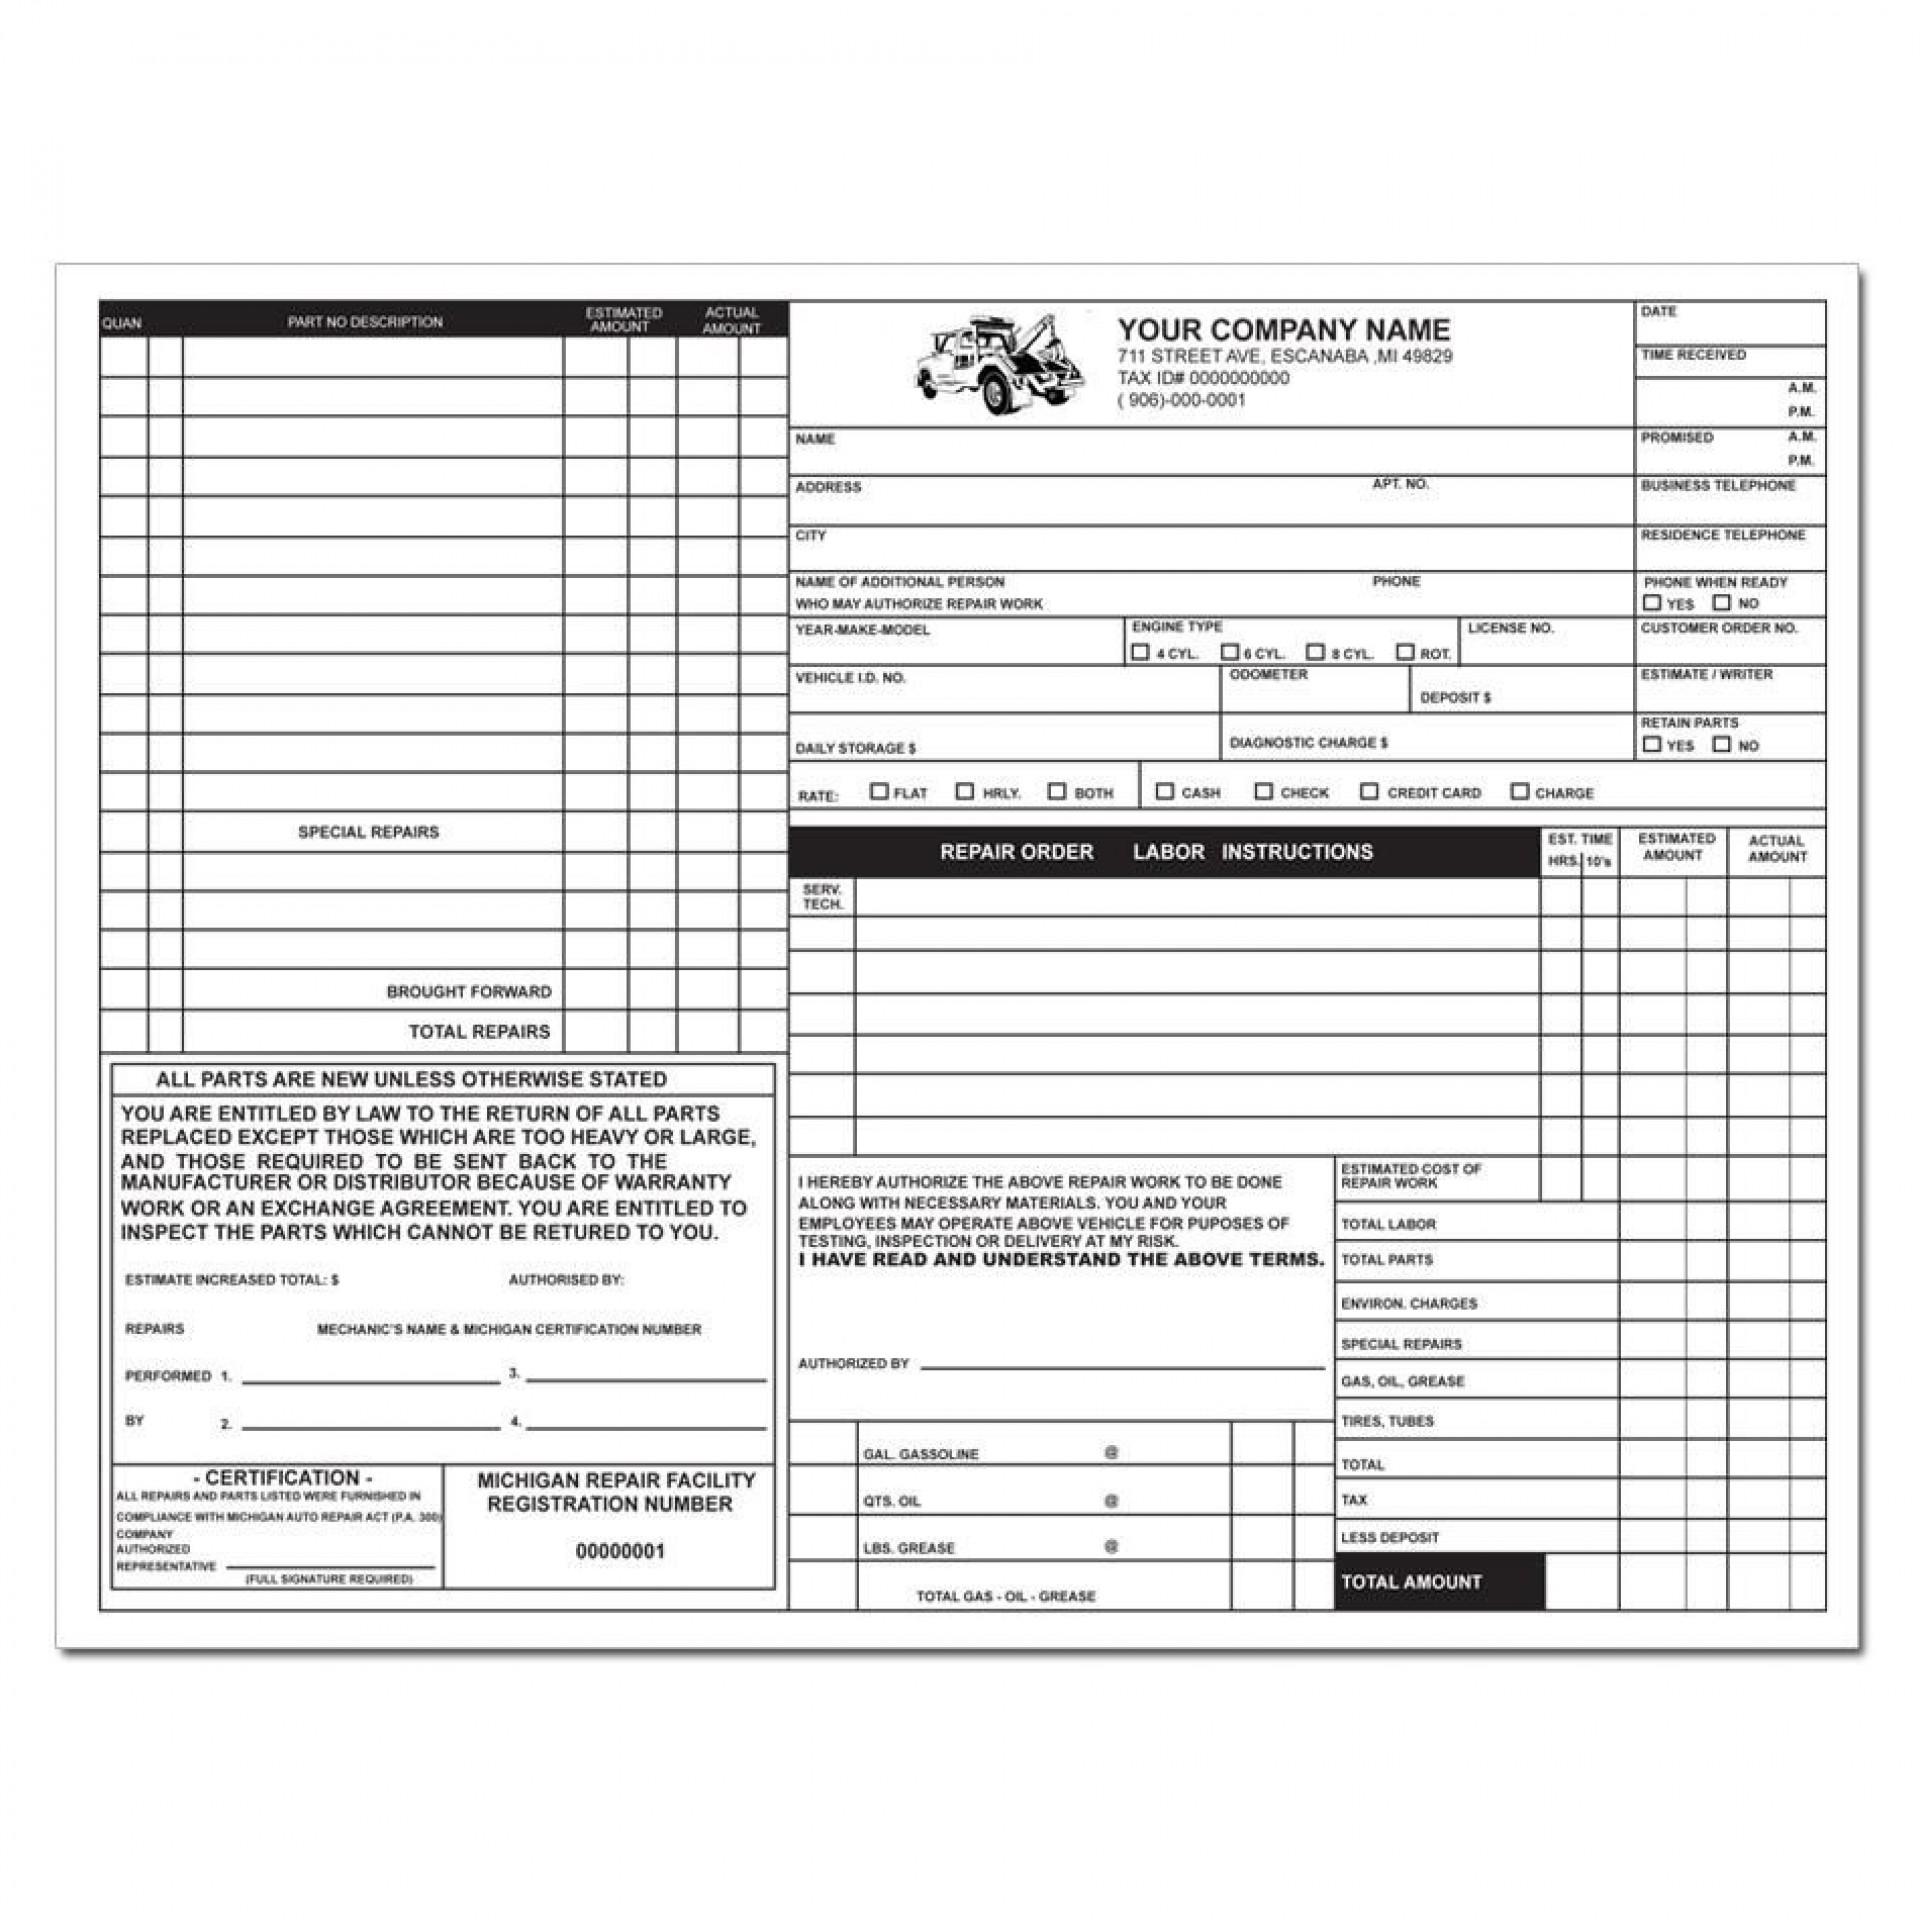 008 Stirring Automotive Repair Estimate Template Image  Auto Free Download Car Form1920